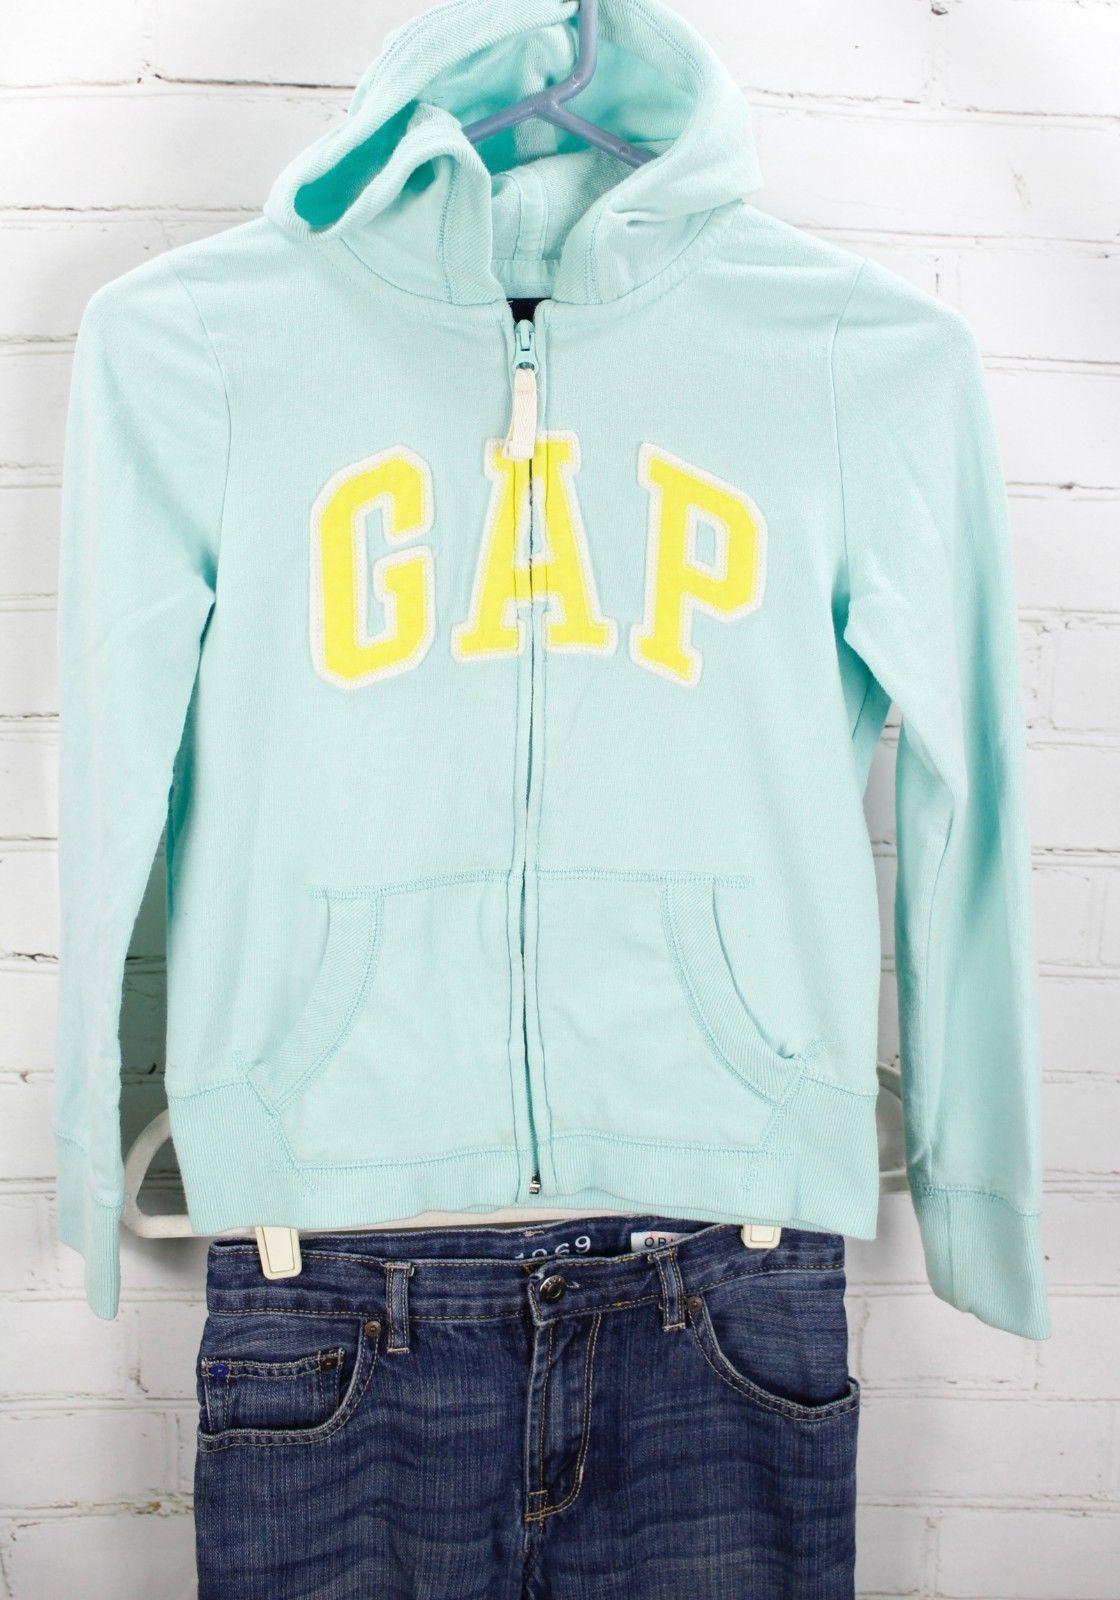 Gap Kids Logo Full Zip Hoodie Sweatshirt + Jeans Girls Size L 10 Outfit Set  image 2